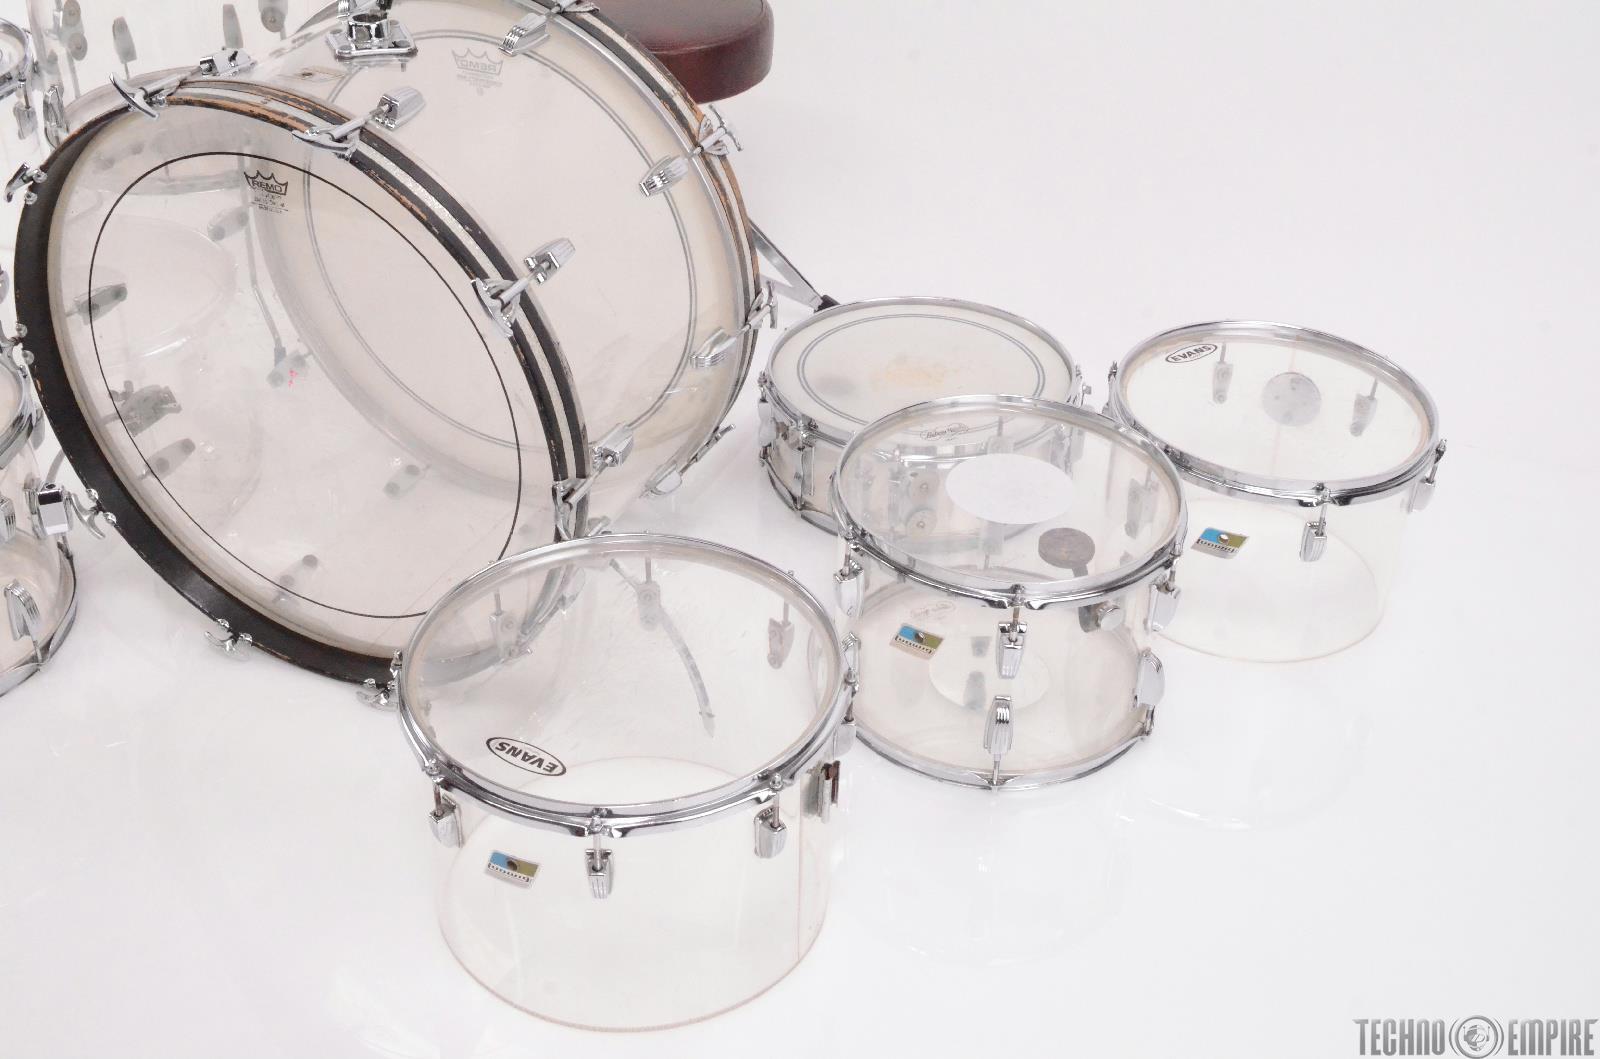 1970 39 s ludwig vistalite 9 piece clear acrylic drum set w beato cases 27783 techno empire. Black Bedroom Furniture Sets. Home Design Ideas